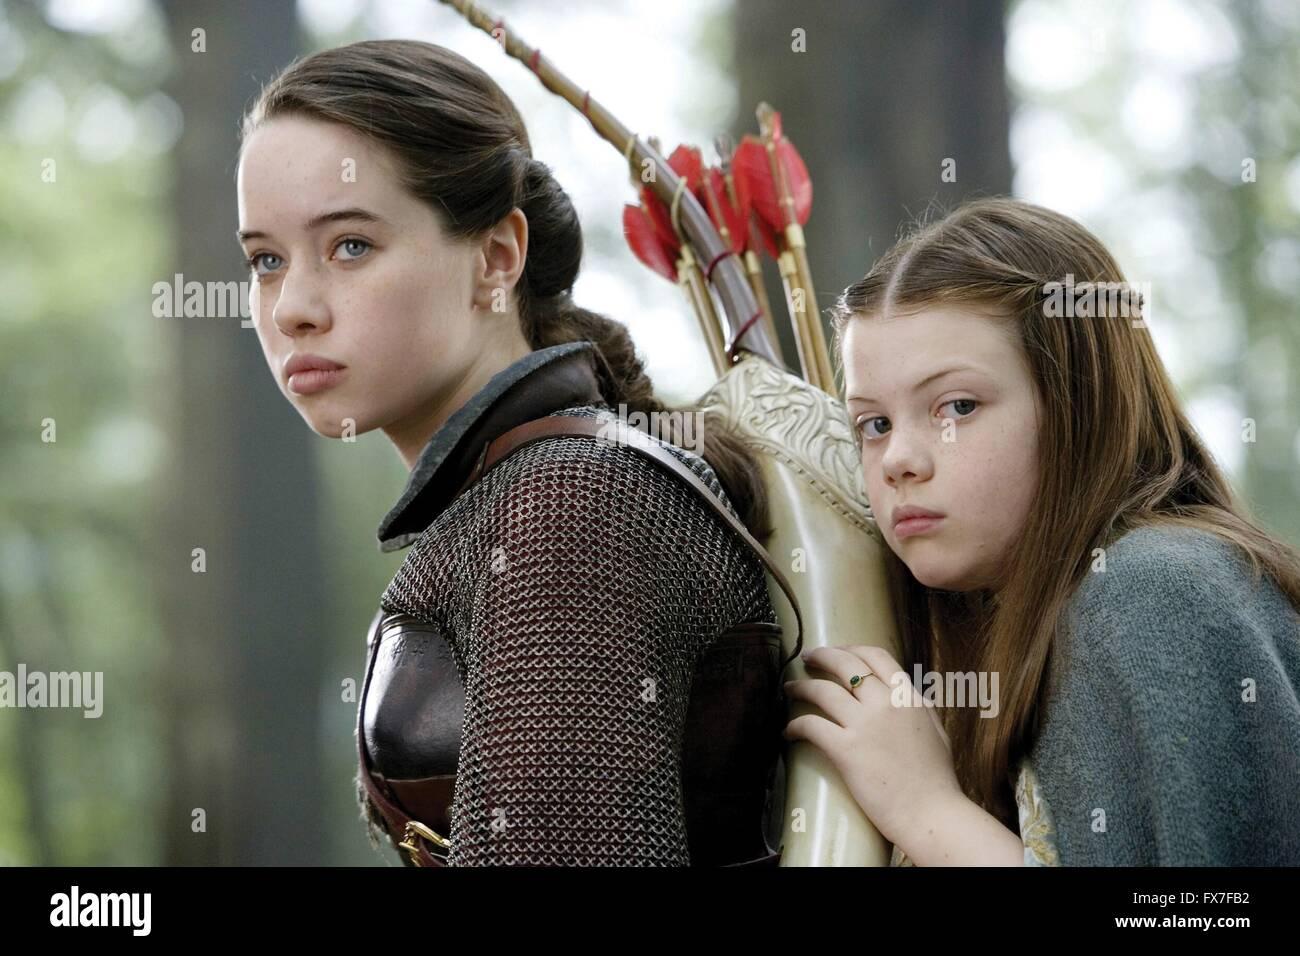 The Chronicles of Narnia: Prince Caspian Year : 2008 UK / USA Director : Andrew Adamson Georgie Henley, Anna Popplewell, - Stock Image